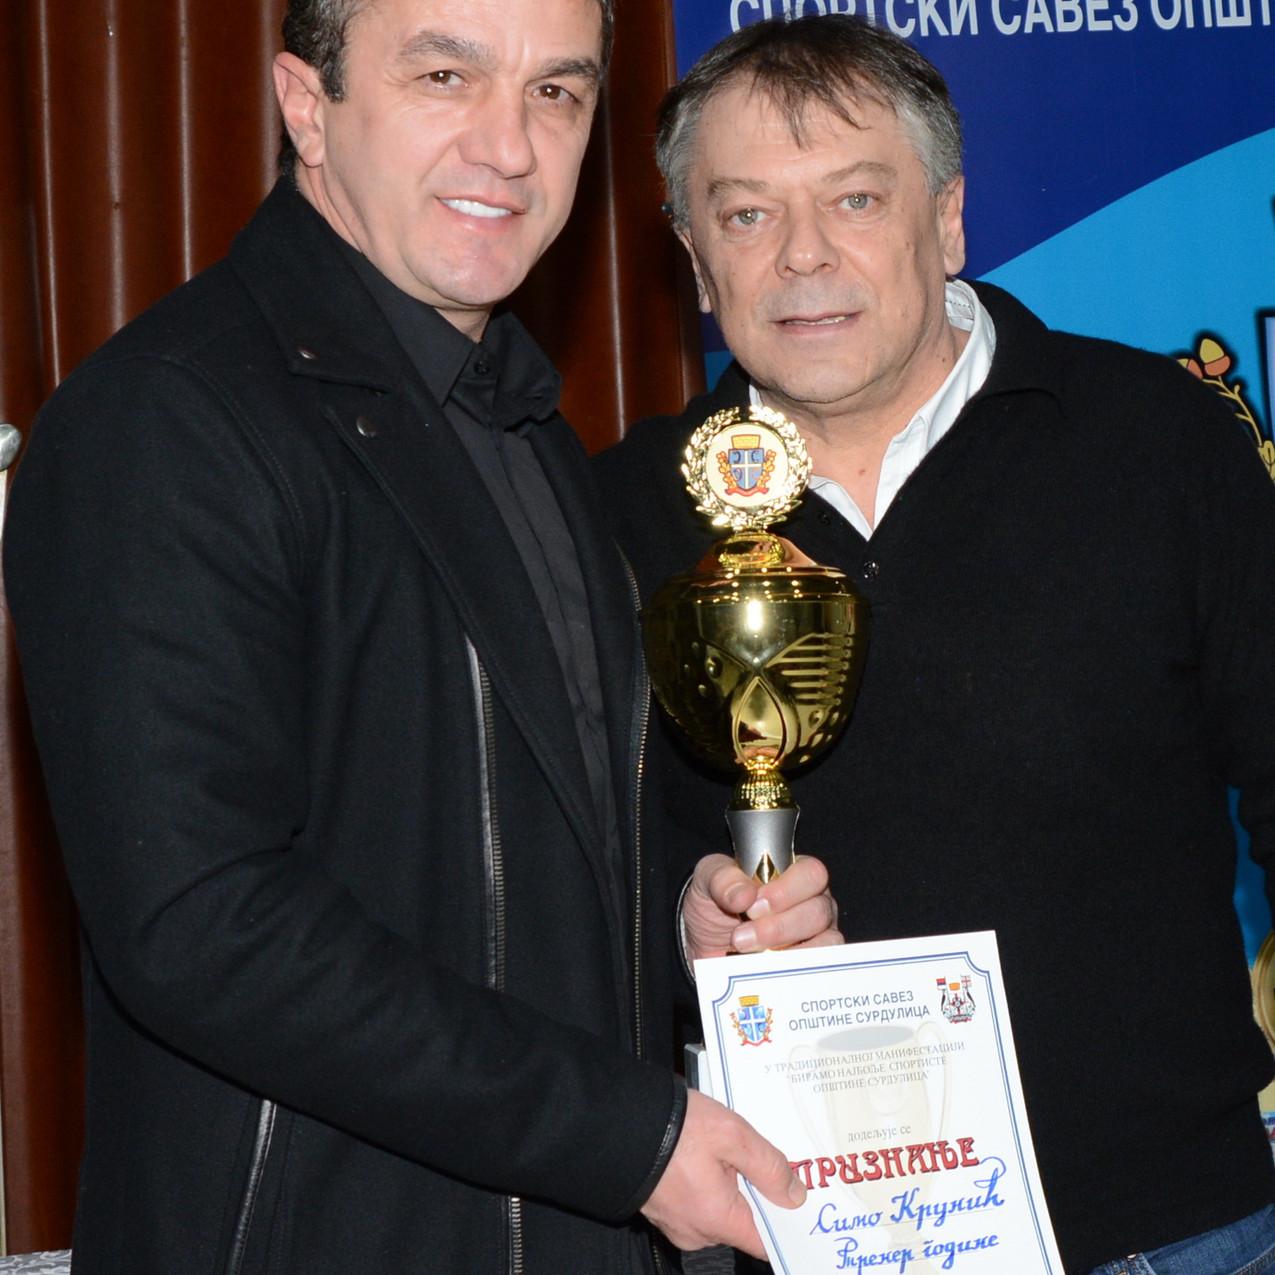 Najuspesniji trener Simo Krunic